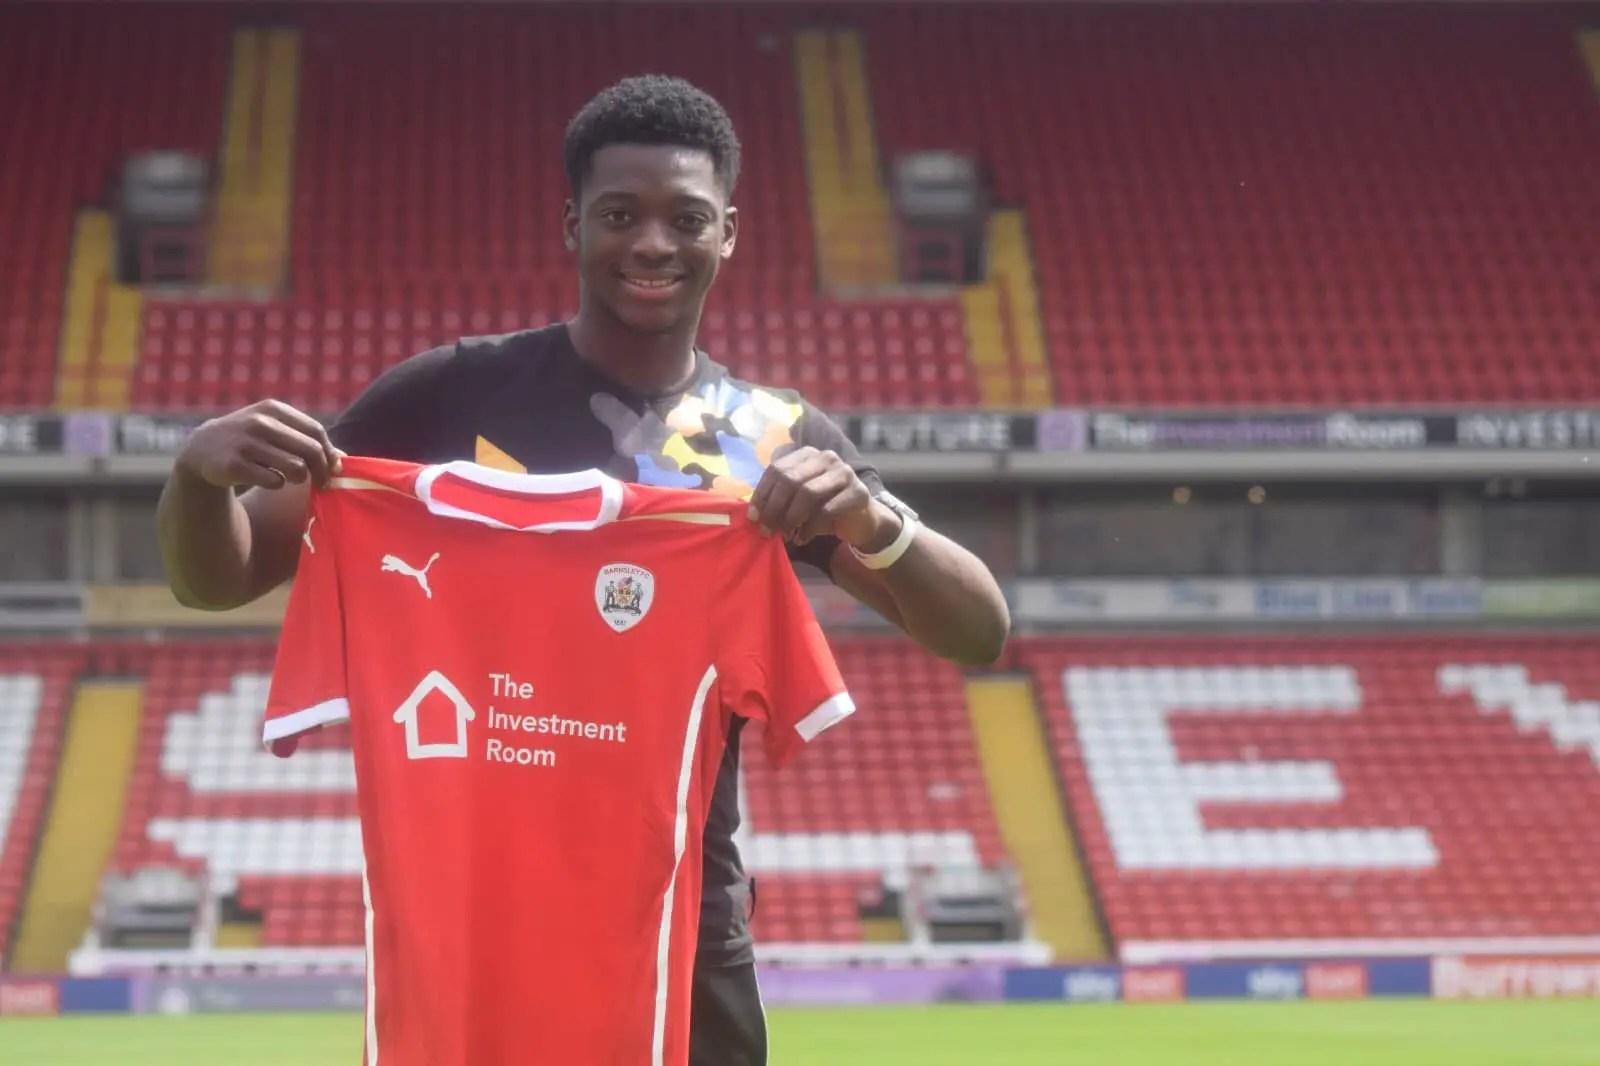 Ex- Eaglets Goalie Daniel Jinadu Joins Championship Club Barnsley